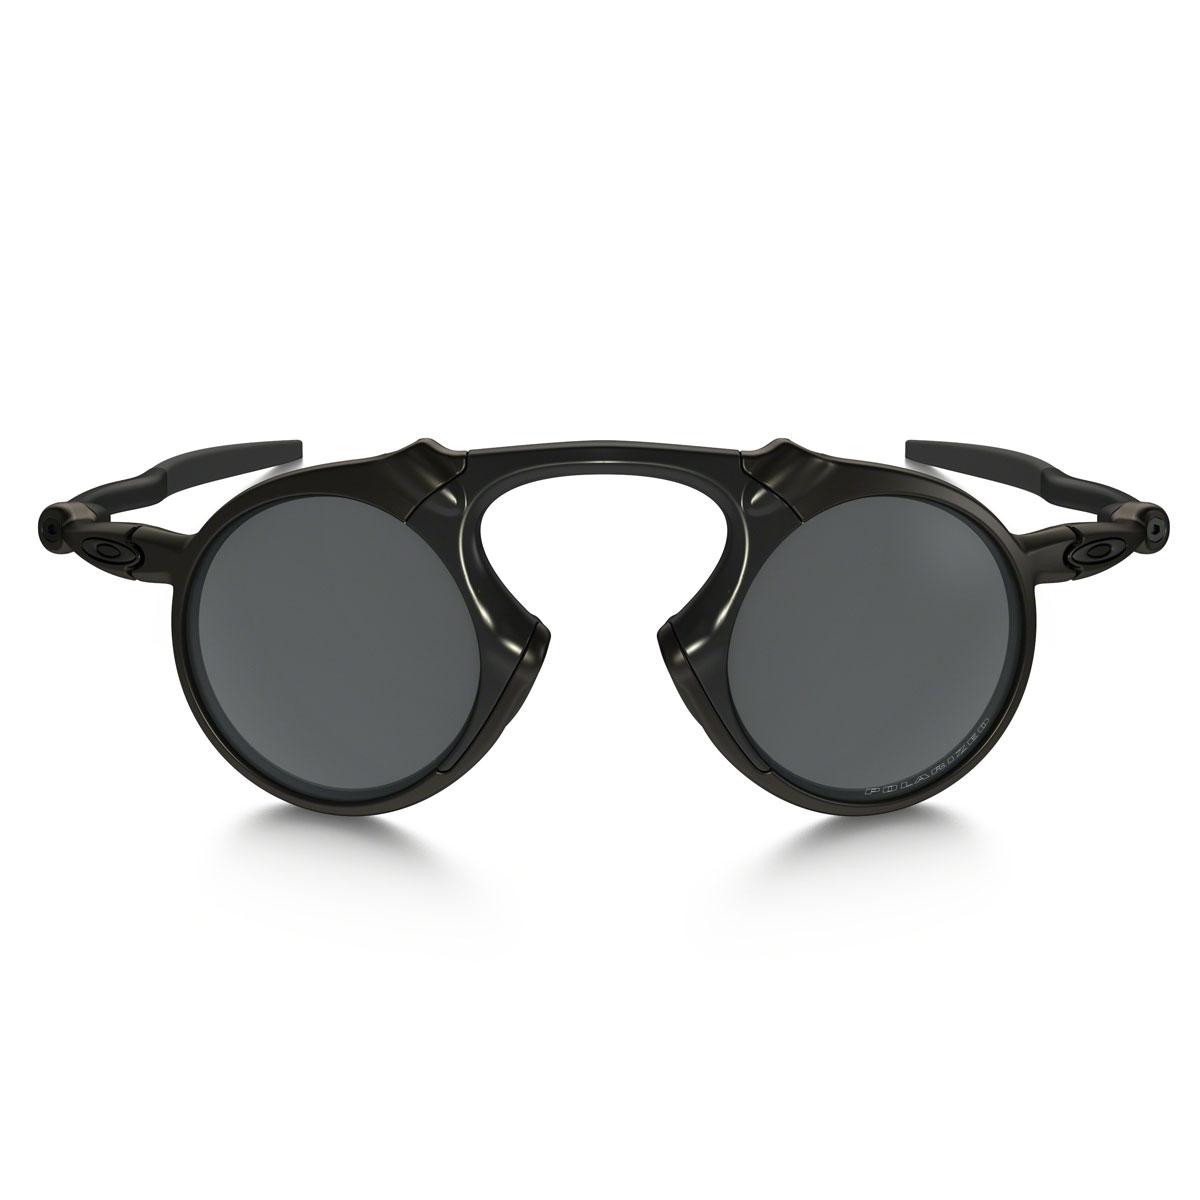 8a48f1a90c7 ... Image of Oakley Madman Polarized Sunglasses - Pewter Frame Black  Iridium Polarized Lens